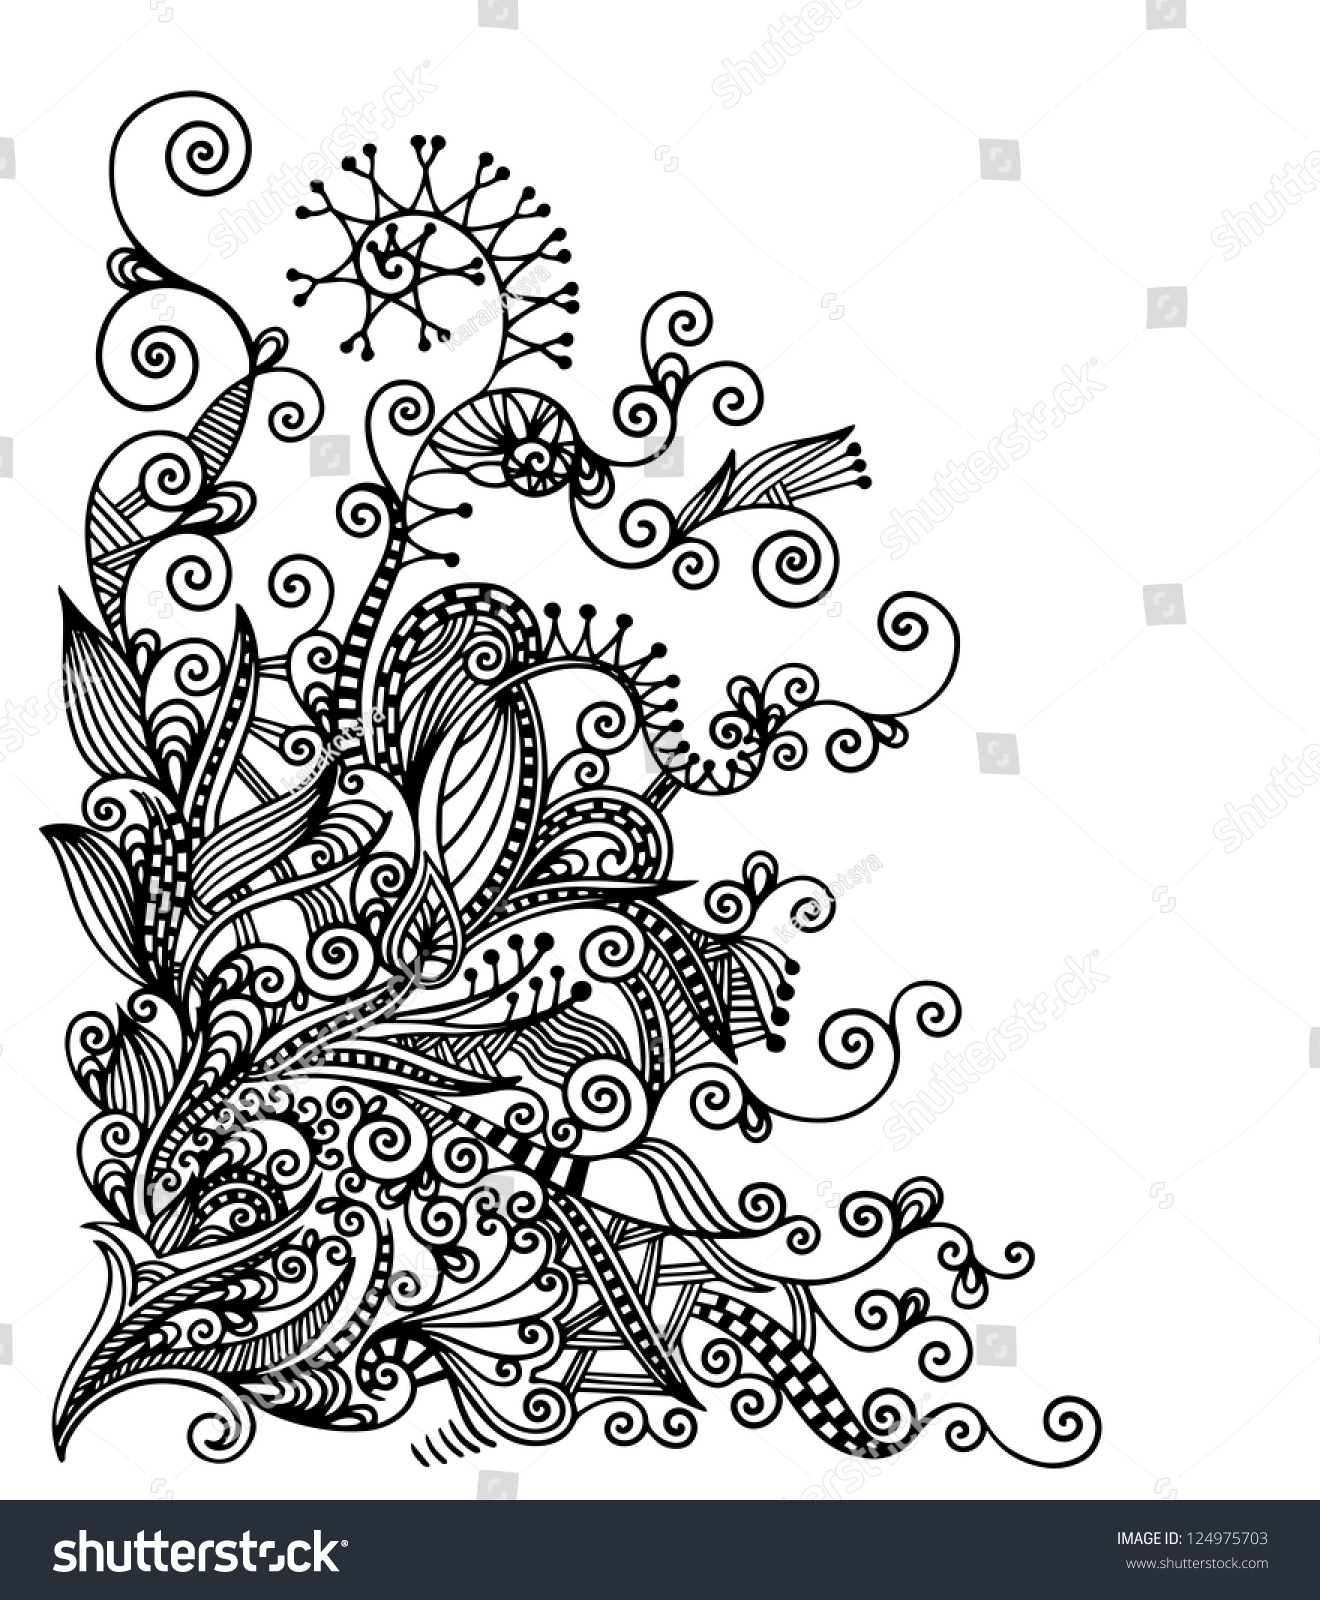 Vector Drawing Lines Html : Original hand draw line art ornate flower design